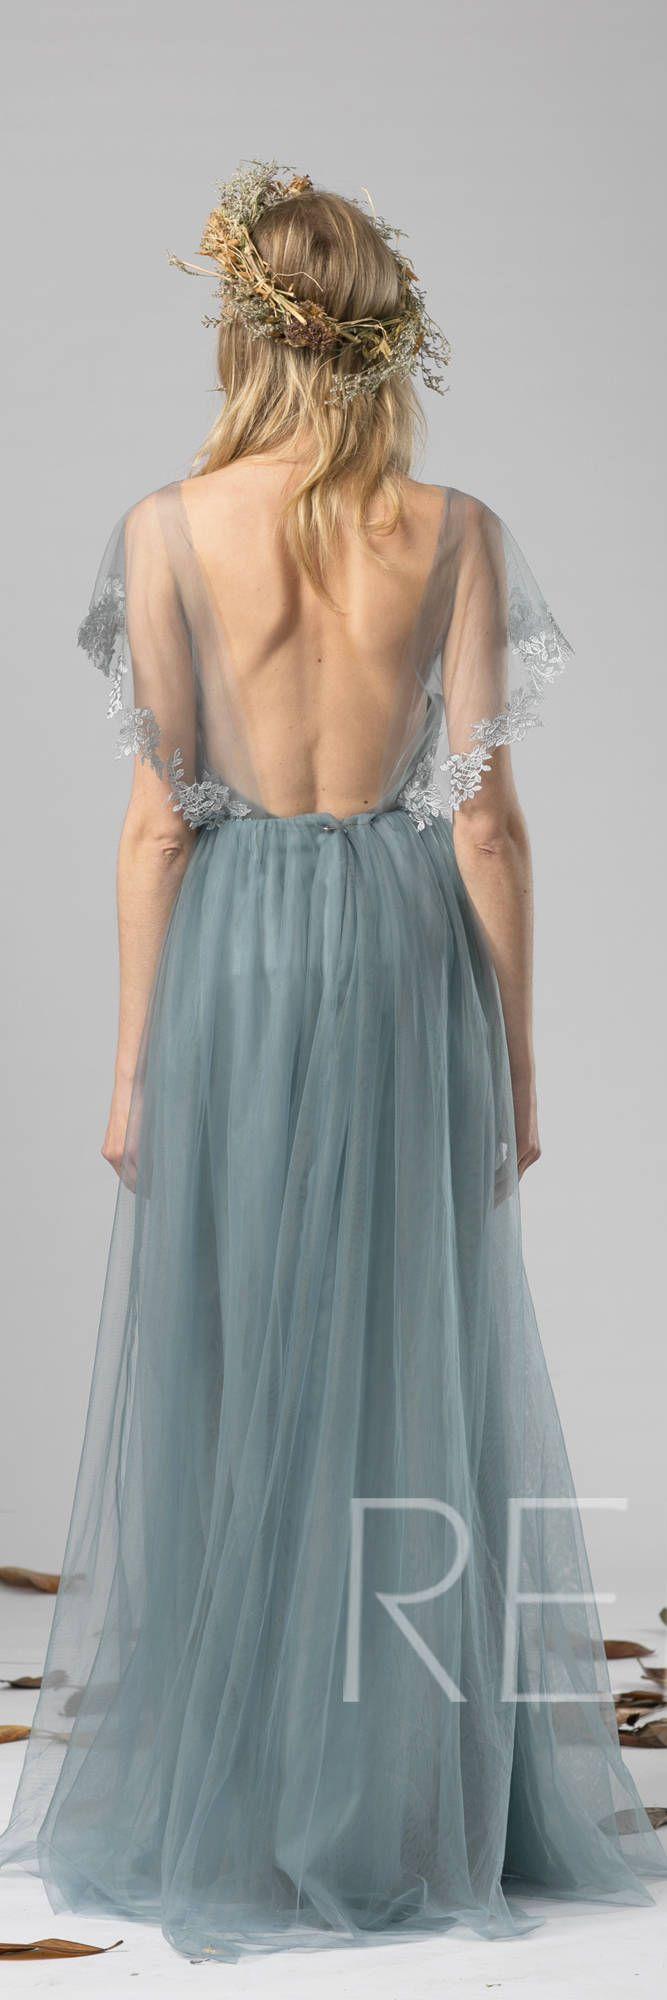 Bridesmaid Dress Dusty Blue Tulle Dress Wedding Dress,Lace Ruffle Sleeve Party Dress,Round Neck Maxi Dress,Open Back Evening Dress(LS408)